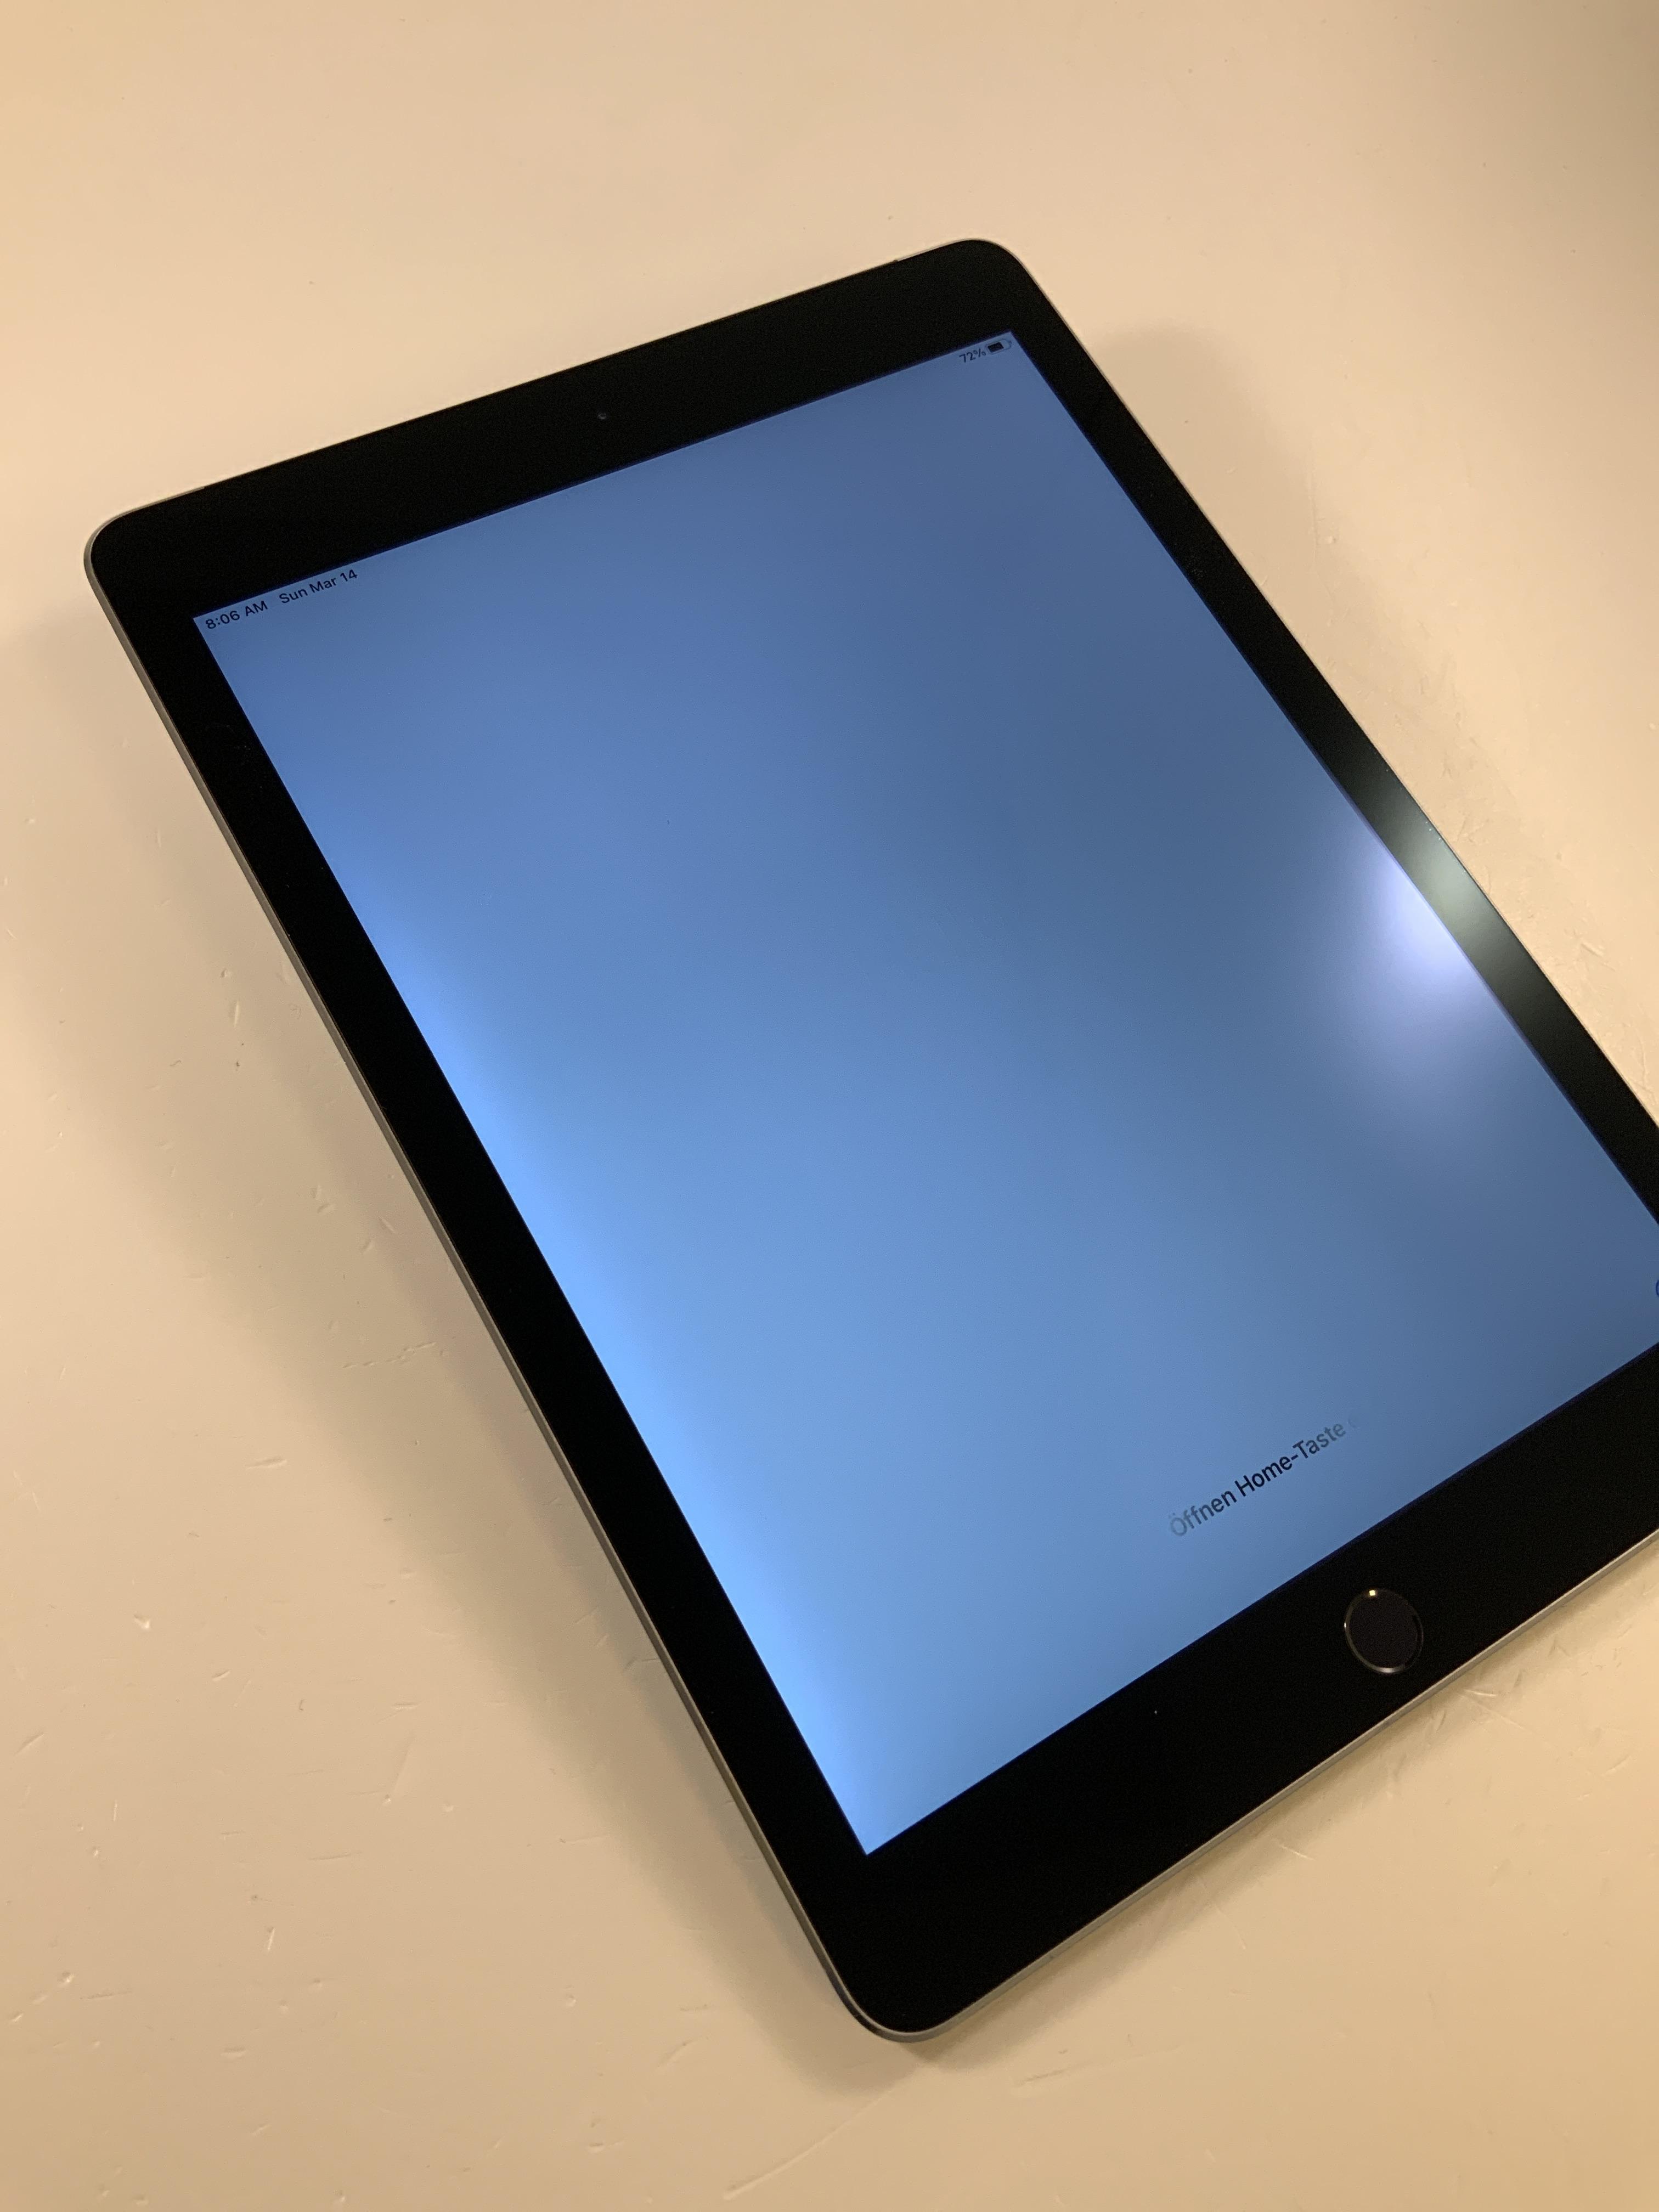 iPad Air 2 Wi-Fi + Cellular 64GB, 64GB, Space Gray, imagen 6